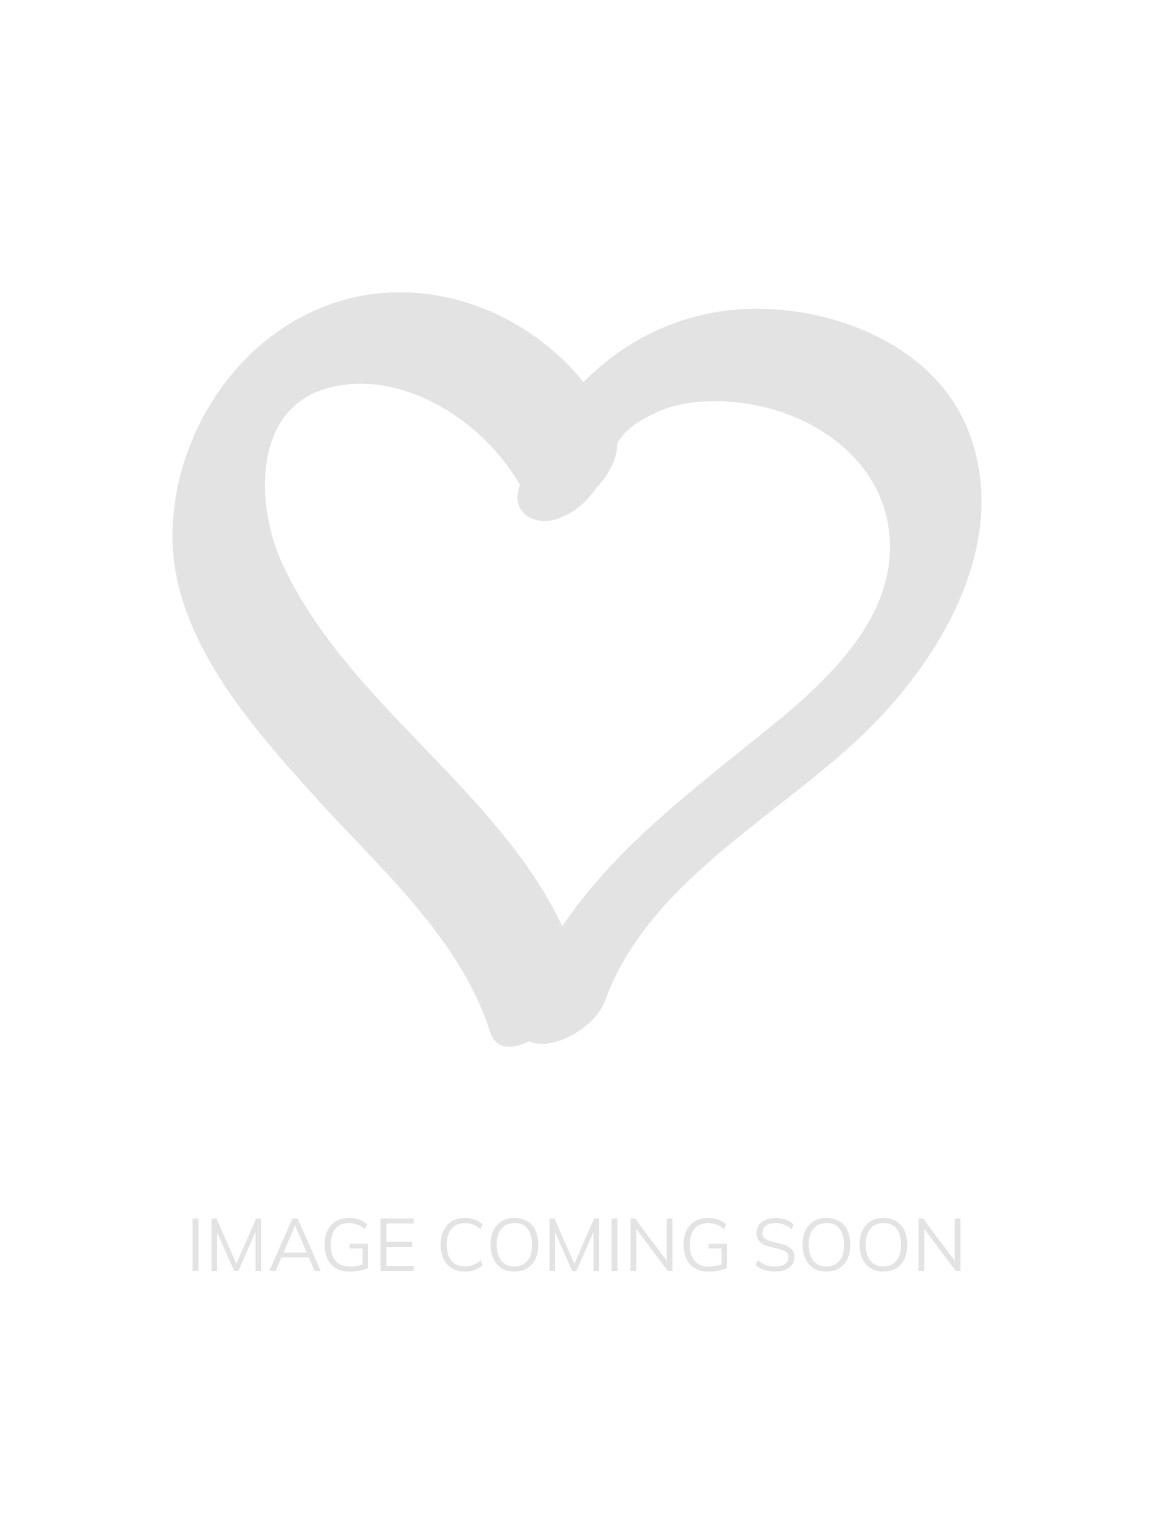 1a06f357570d2 Flower Elegance Full Cup Bra - Pink Beige